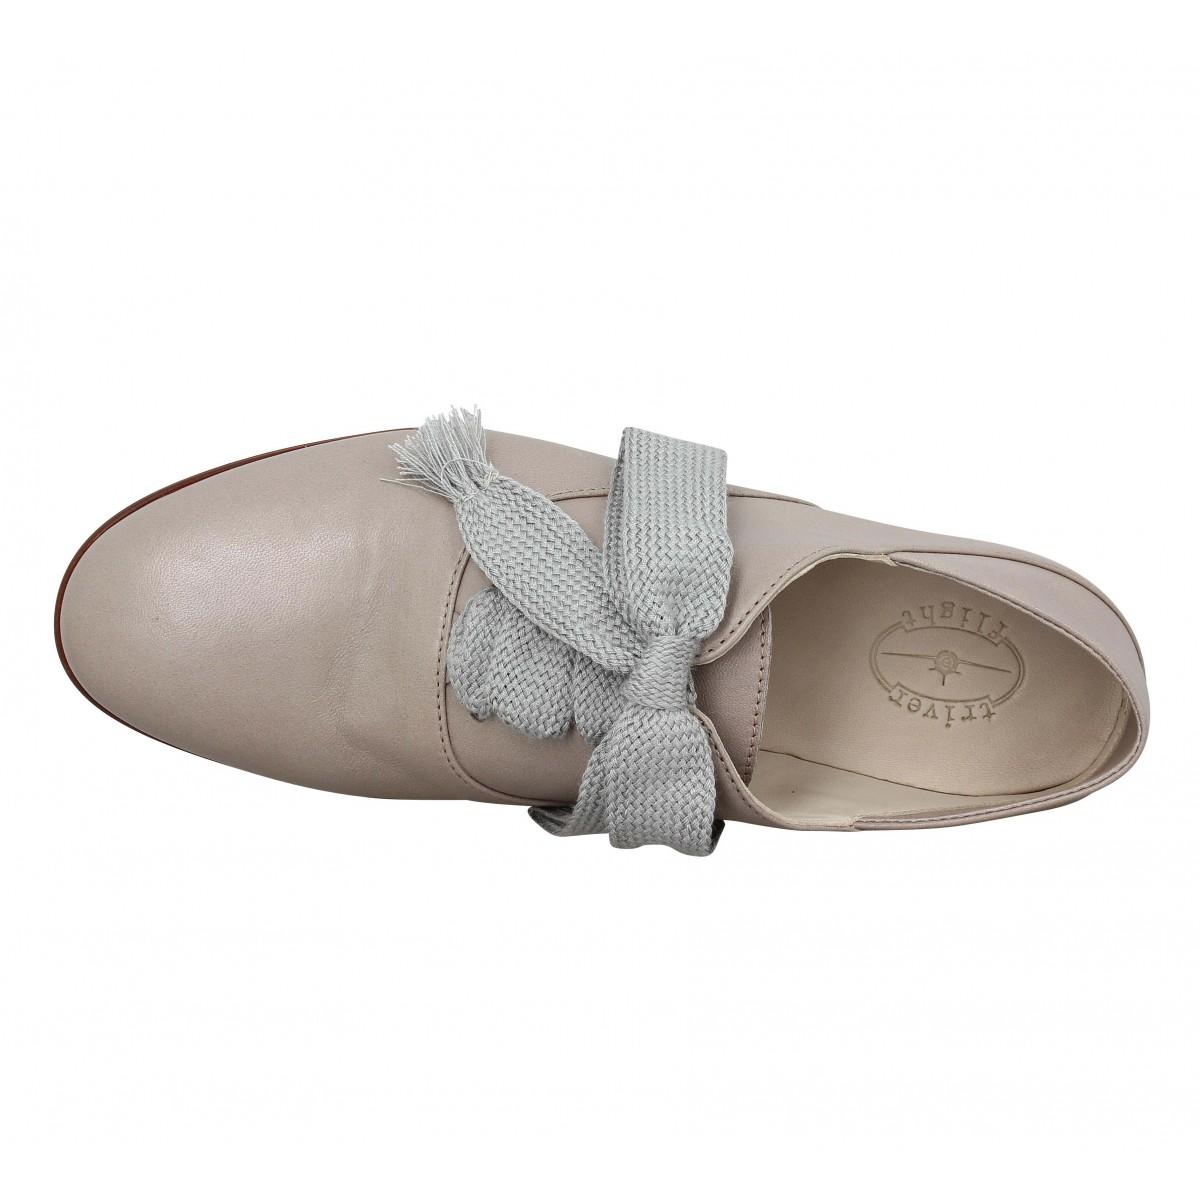 triver flight 2251 cuir femme perle femme fanny chaussures. Black Bedroom Furniture Sets. Home Design Ideas